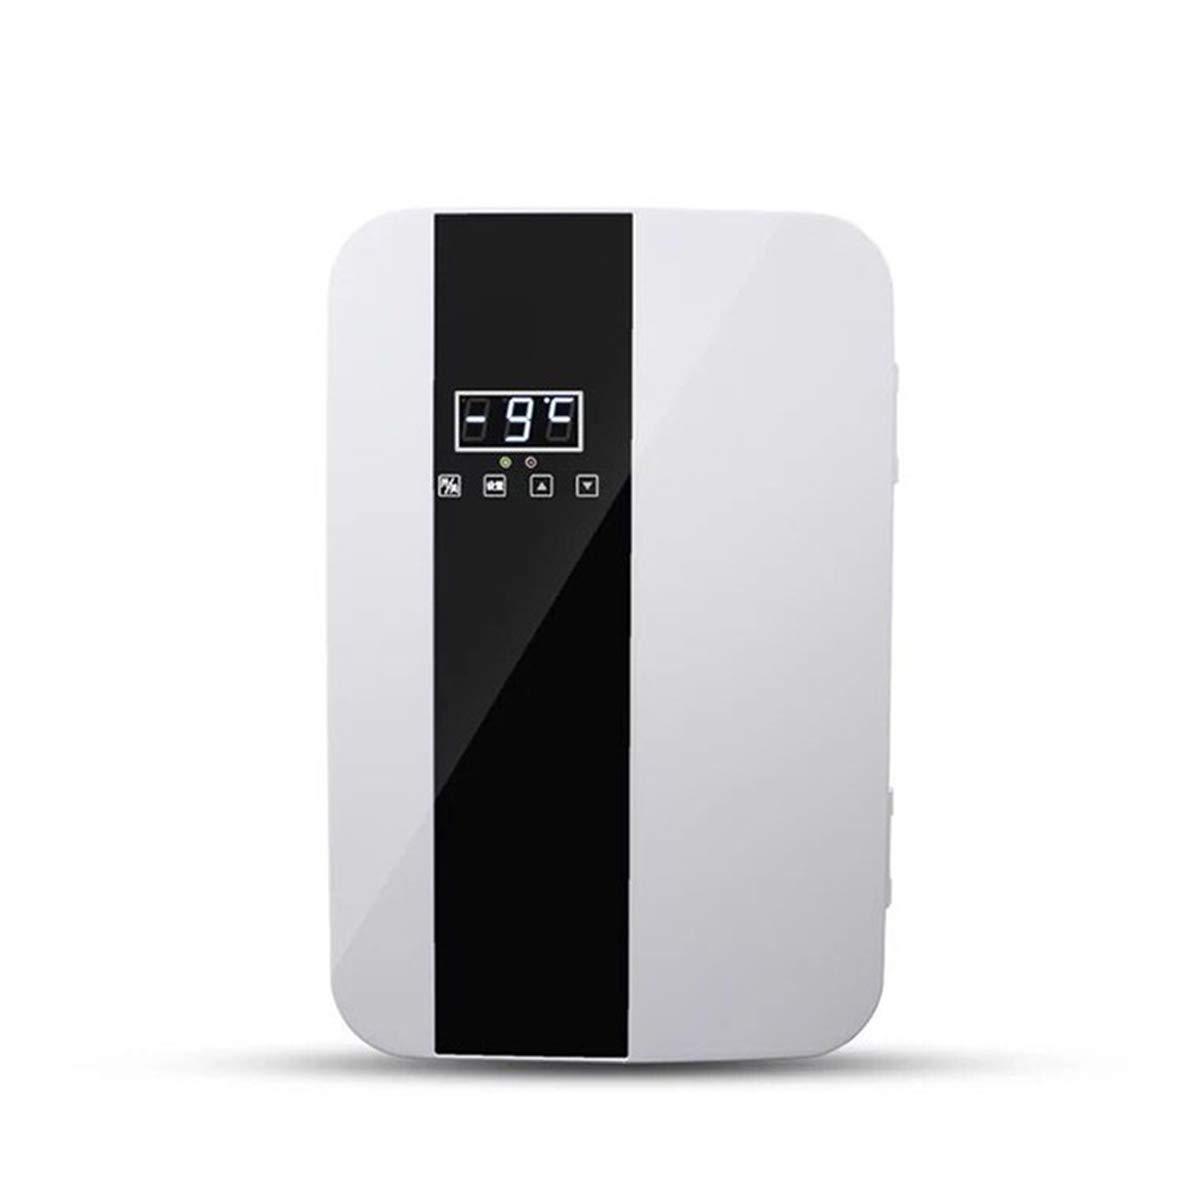 Dapang Dual core Fast Cooling Mini Fridge, CNC LED Display - Cools & Heats,Adjustable Removal partition for Dorm, Home, Car - AC & DC,22L